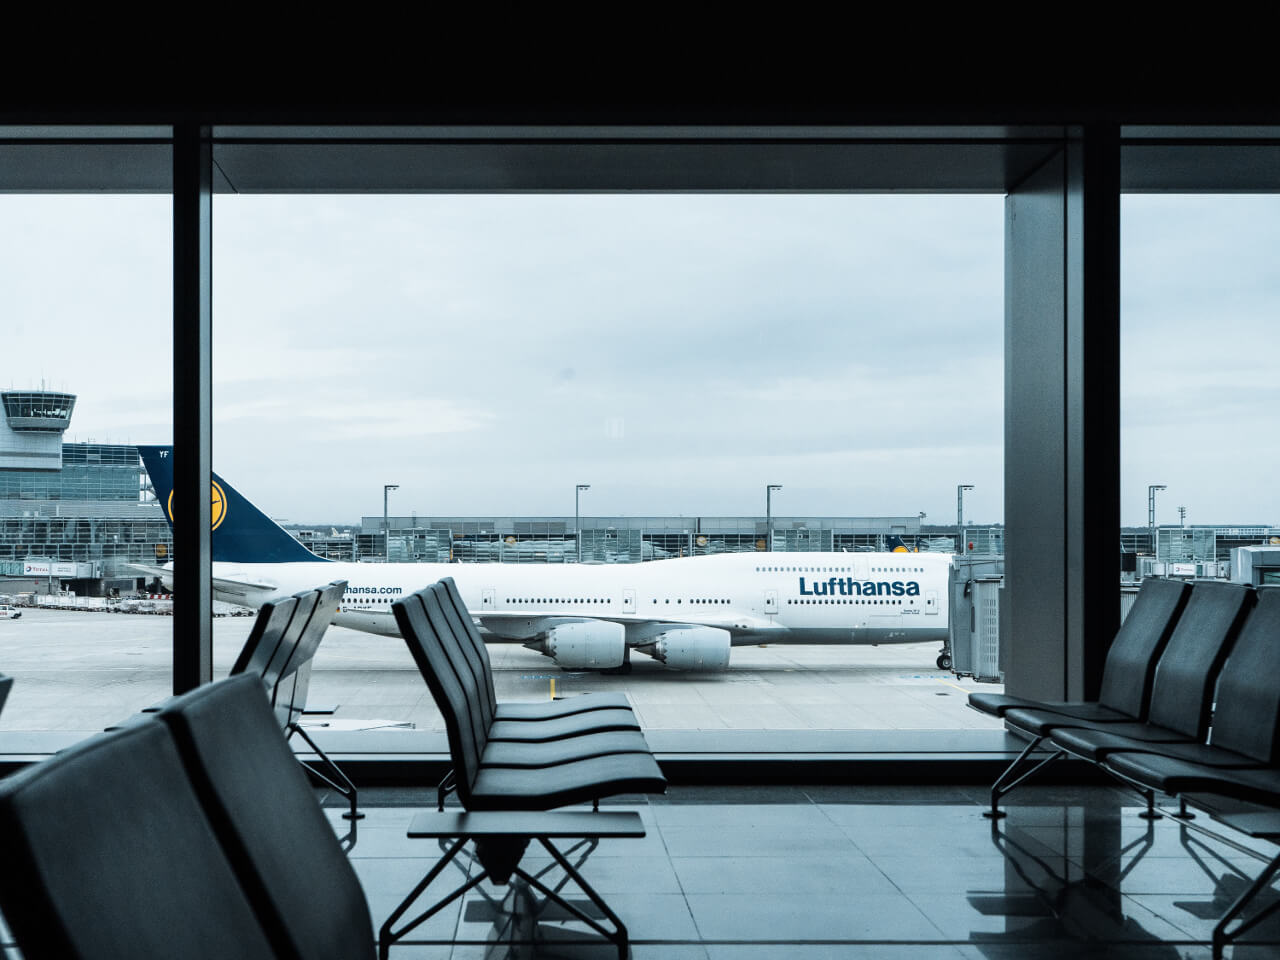 Terminal lotniska z widzianym samolotem za oknem